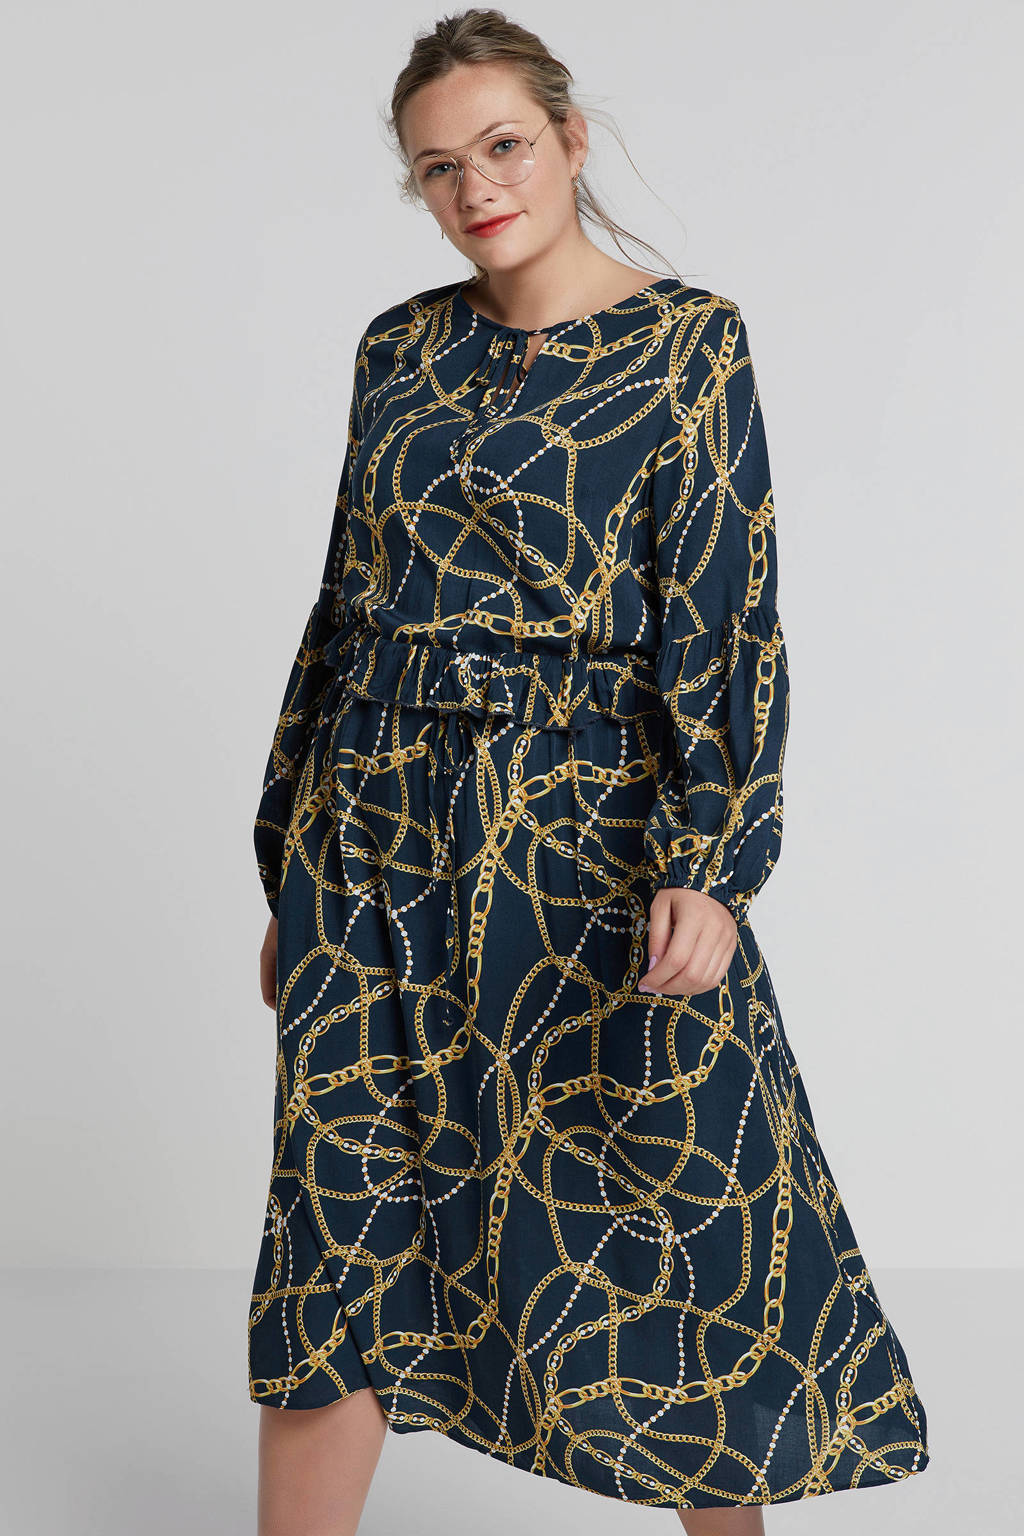 ONLY carmakoma jurk met all over print, Donkergroen/geel/oranje/wit